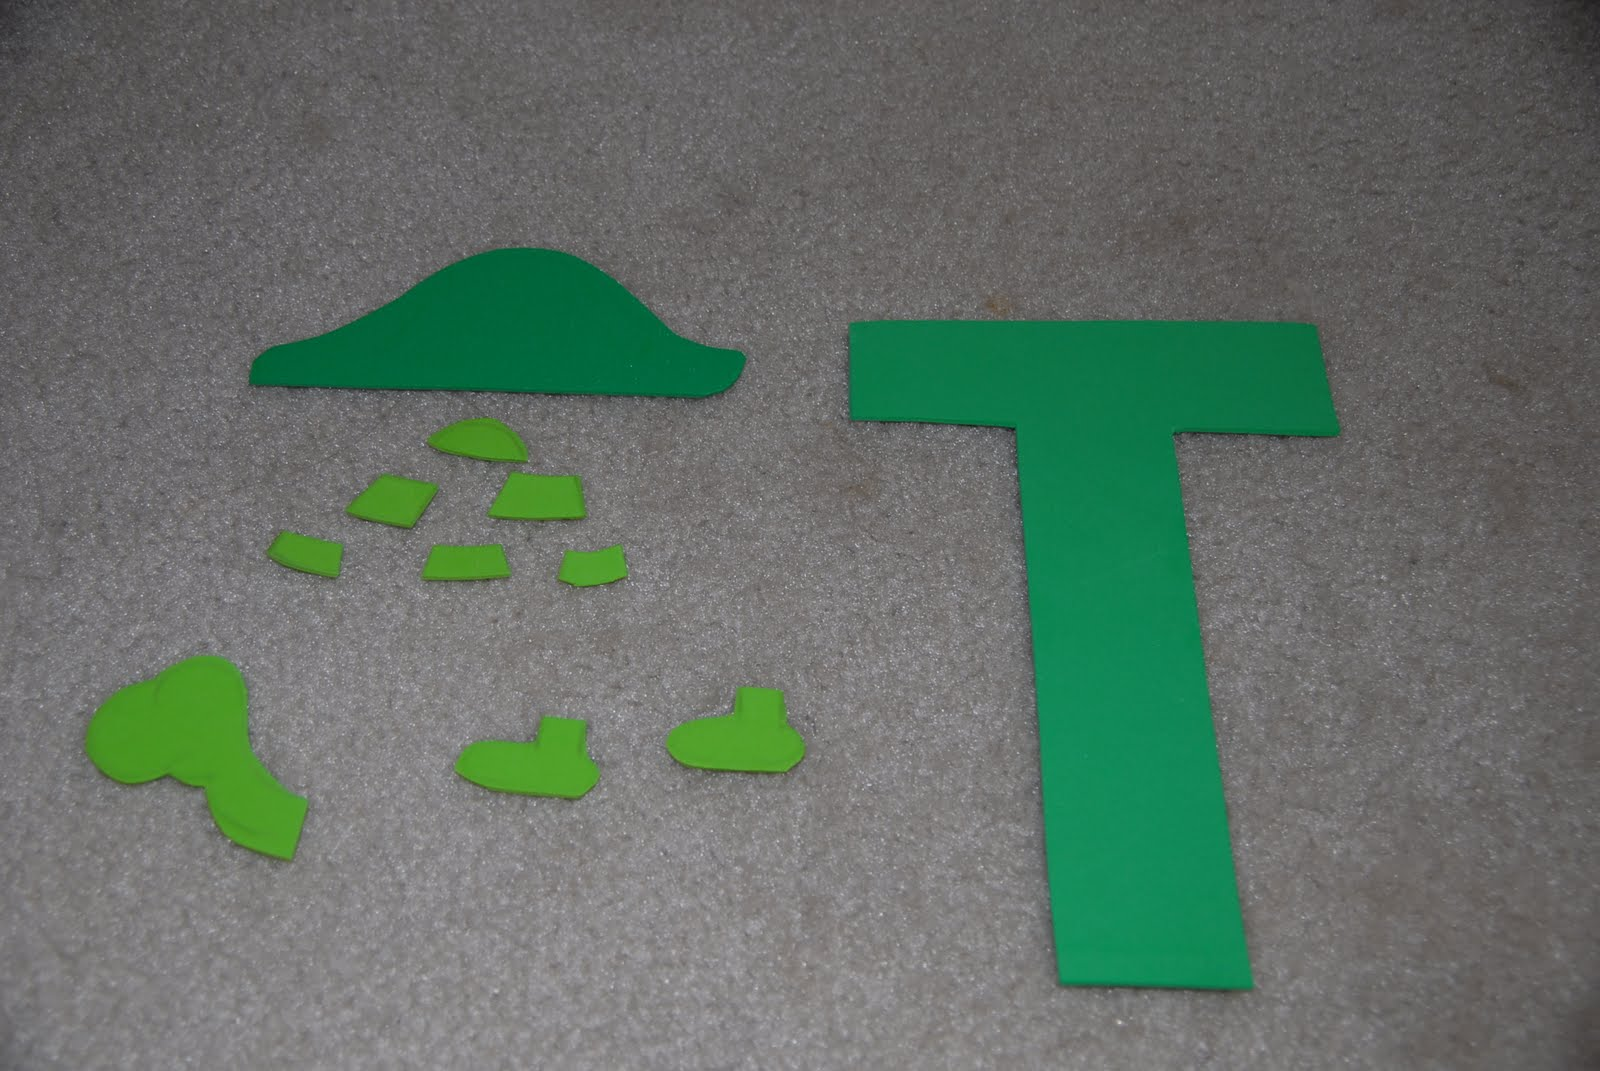 Letter t crafts preschool and kindergarten letter t crafts spiritdancerdesigns Gallery